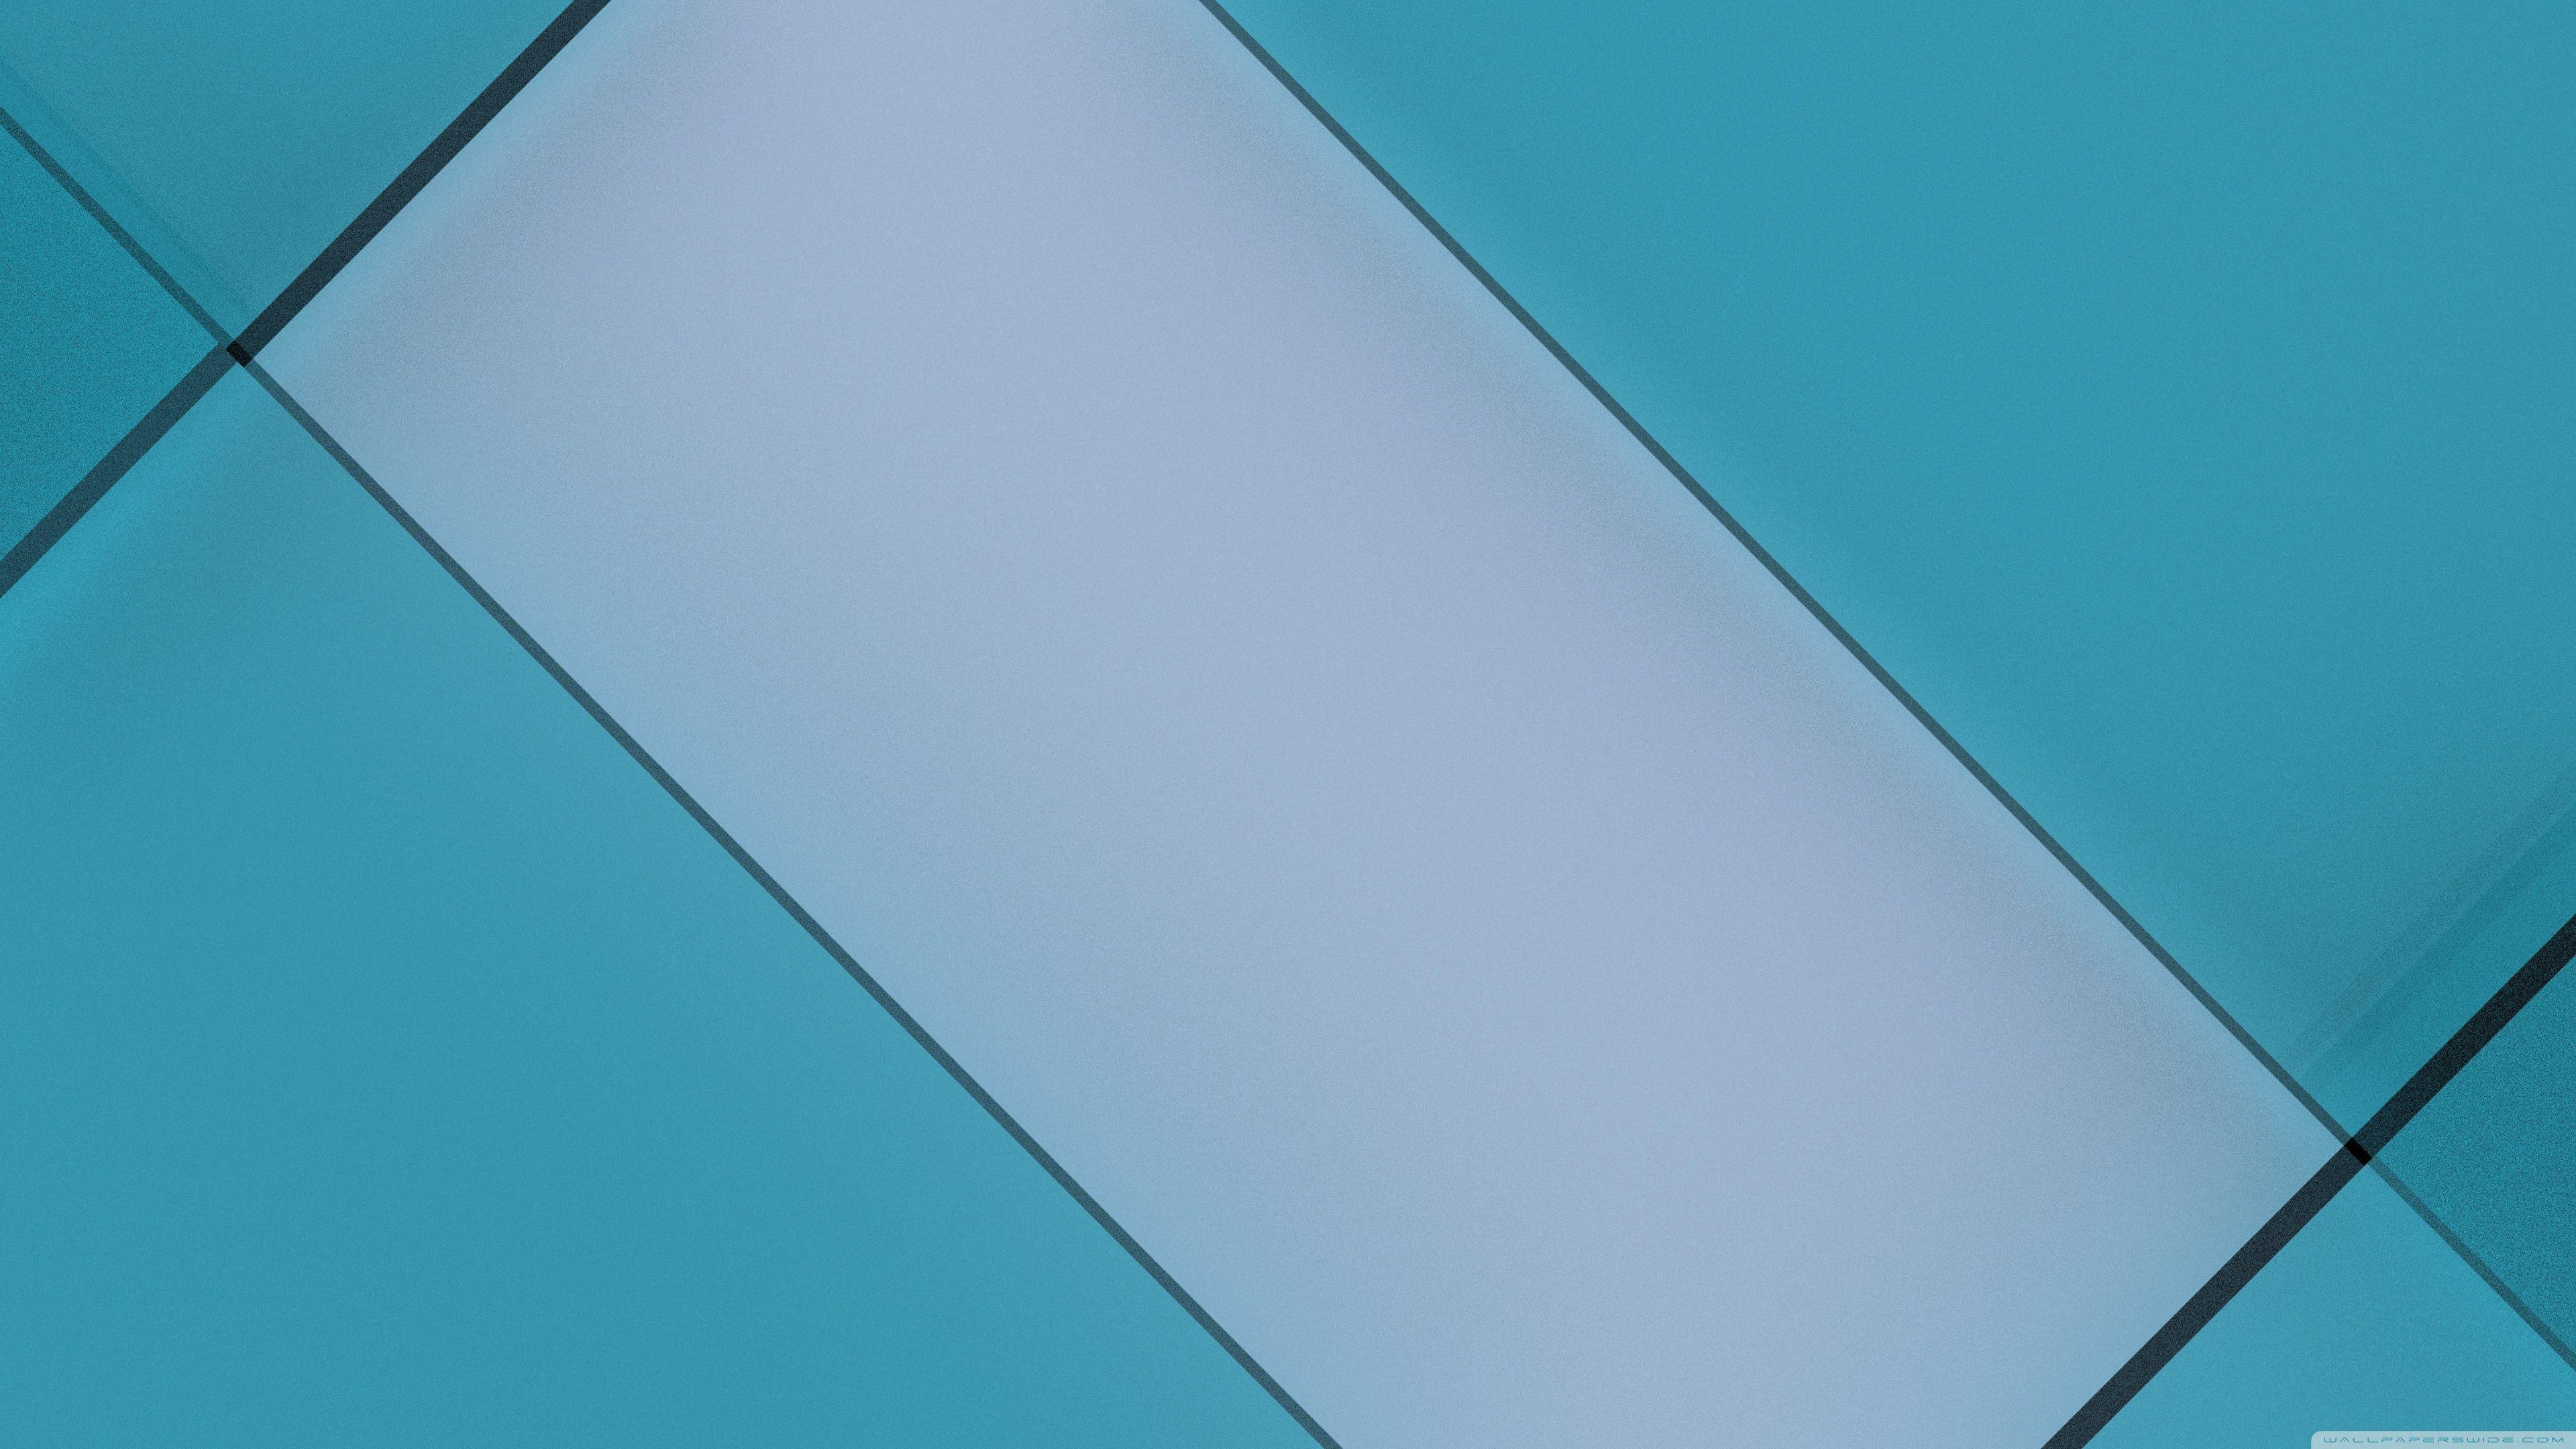 16K Ultra HD Dark Wallpapers - Top Free 16K Ultra HD Dark